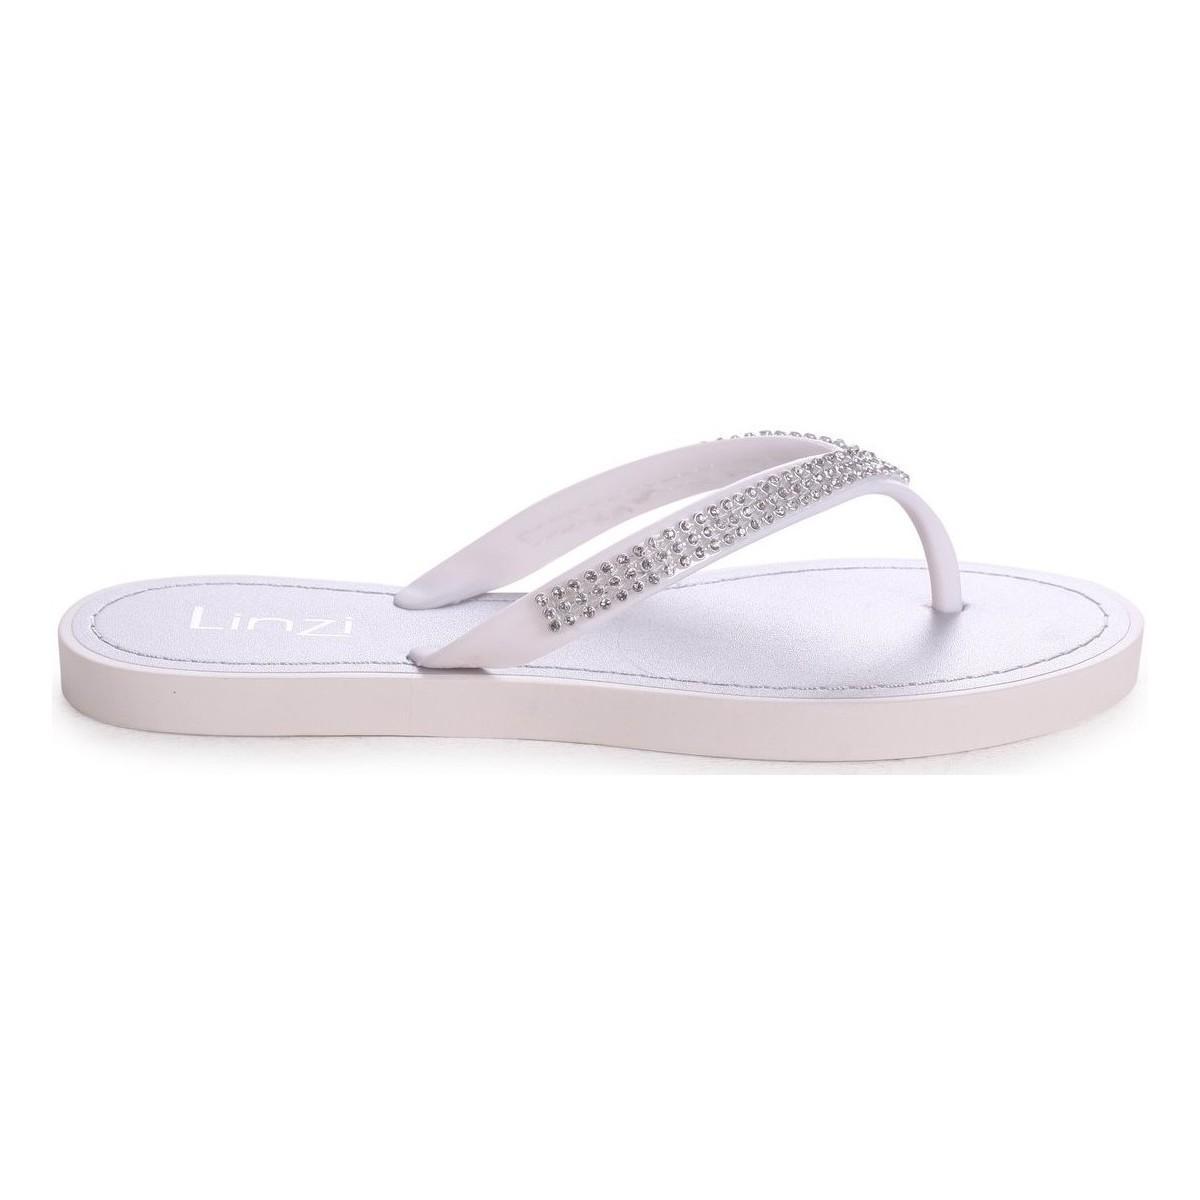 0a9c891b5 Linzi Cher Women s Flip Flops   Sandals (shoes) In White in White - Lyst